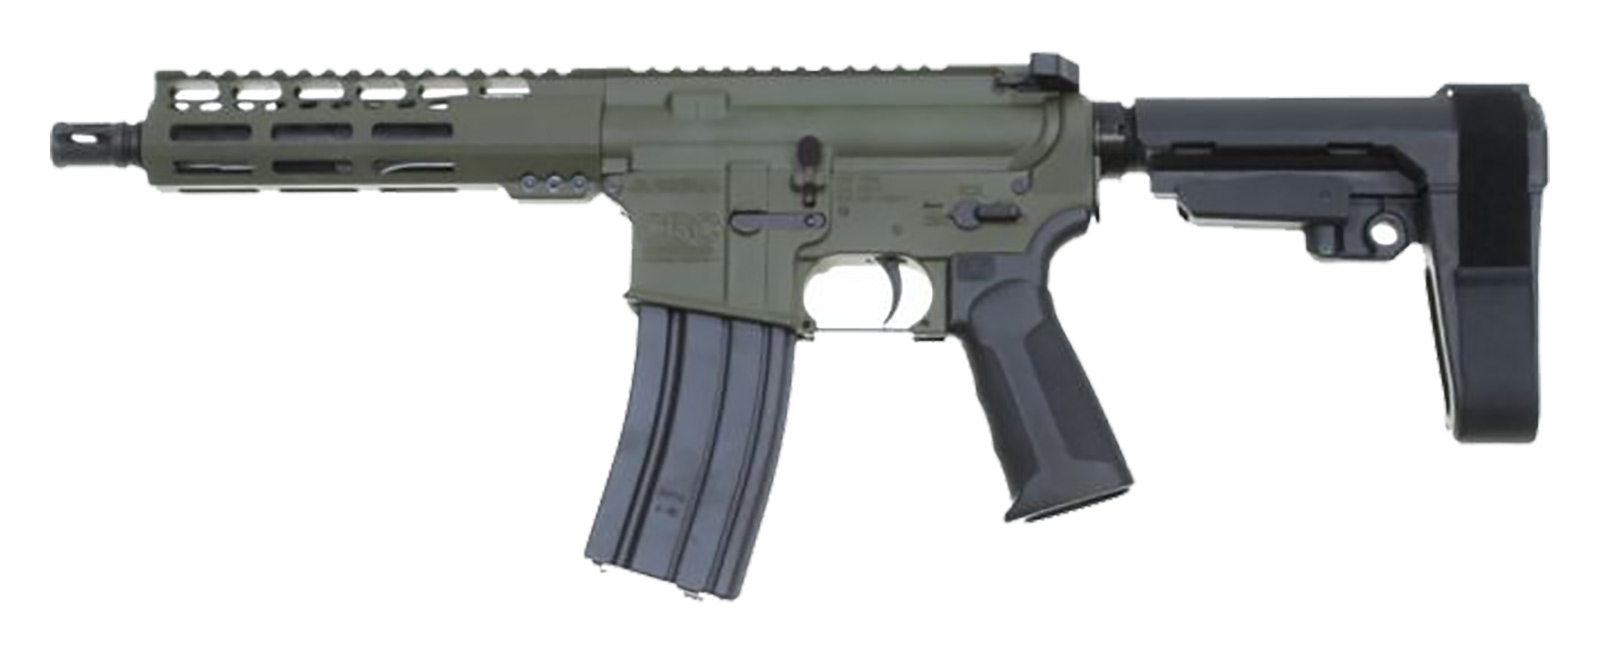 CBC PS2 Forged Aluminum AR Pistol - OD Green | 5 56 NATO | 7 5